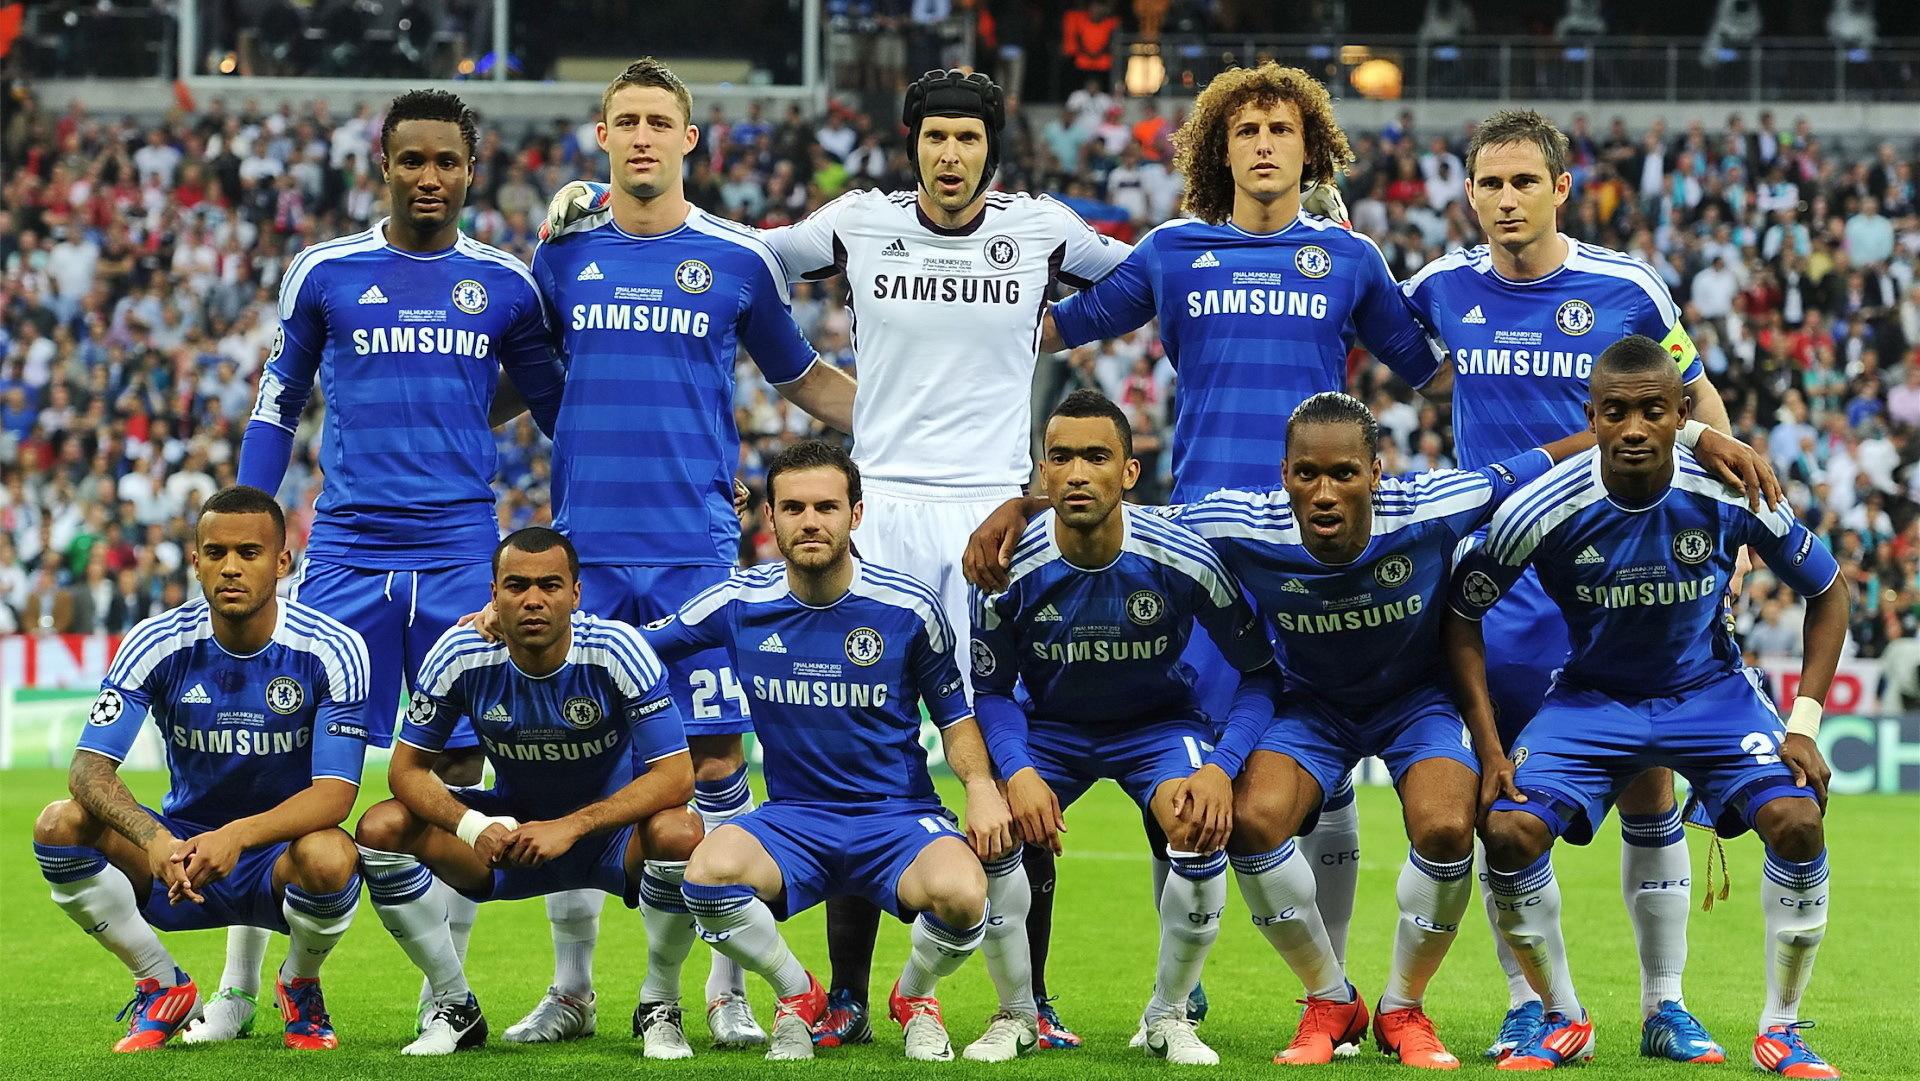 Челси команда фото